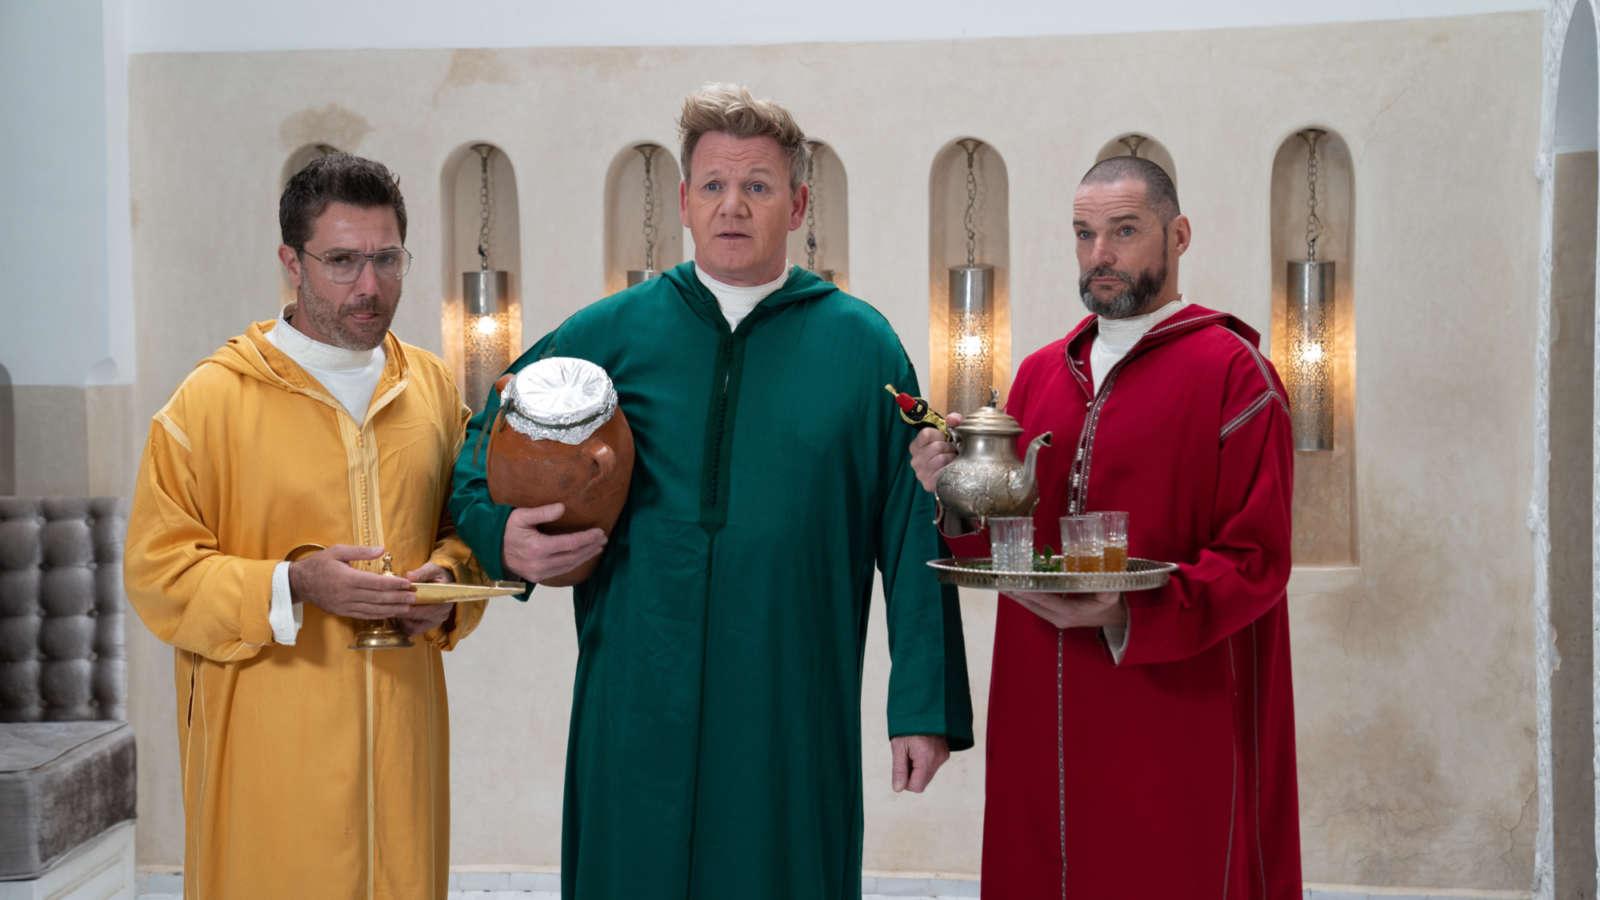 Gordon, Gino and Fred: The Three Unwise Men